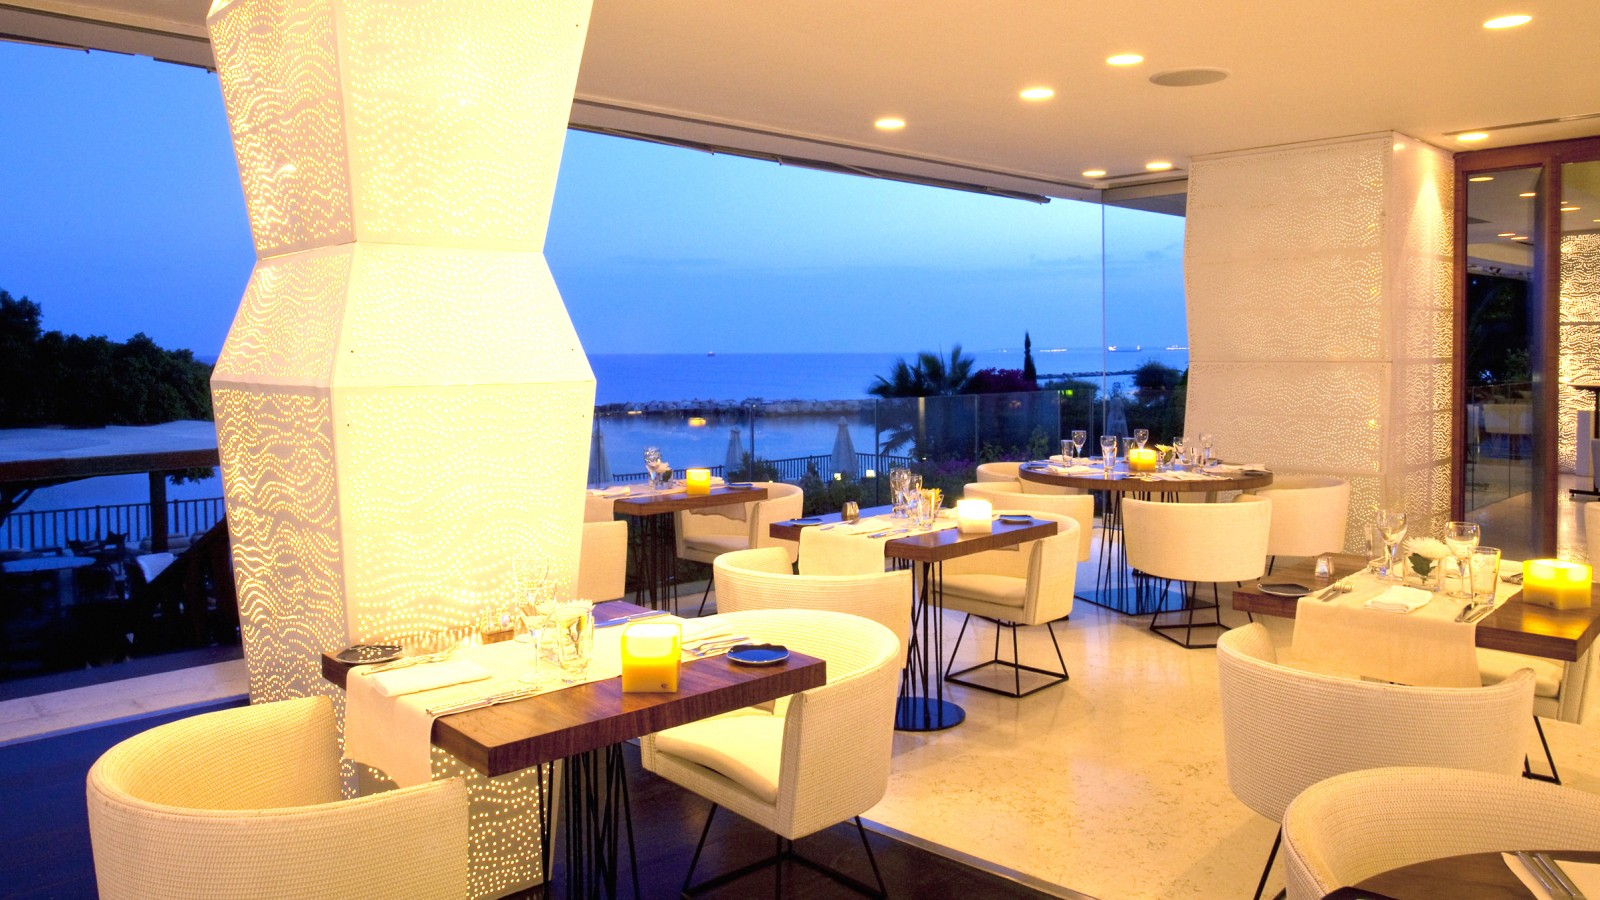 Caprice Restaurant, The Londa Hotel